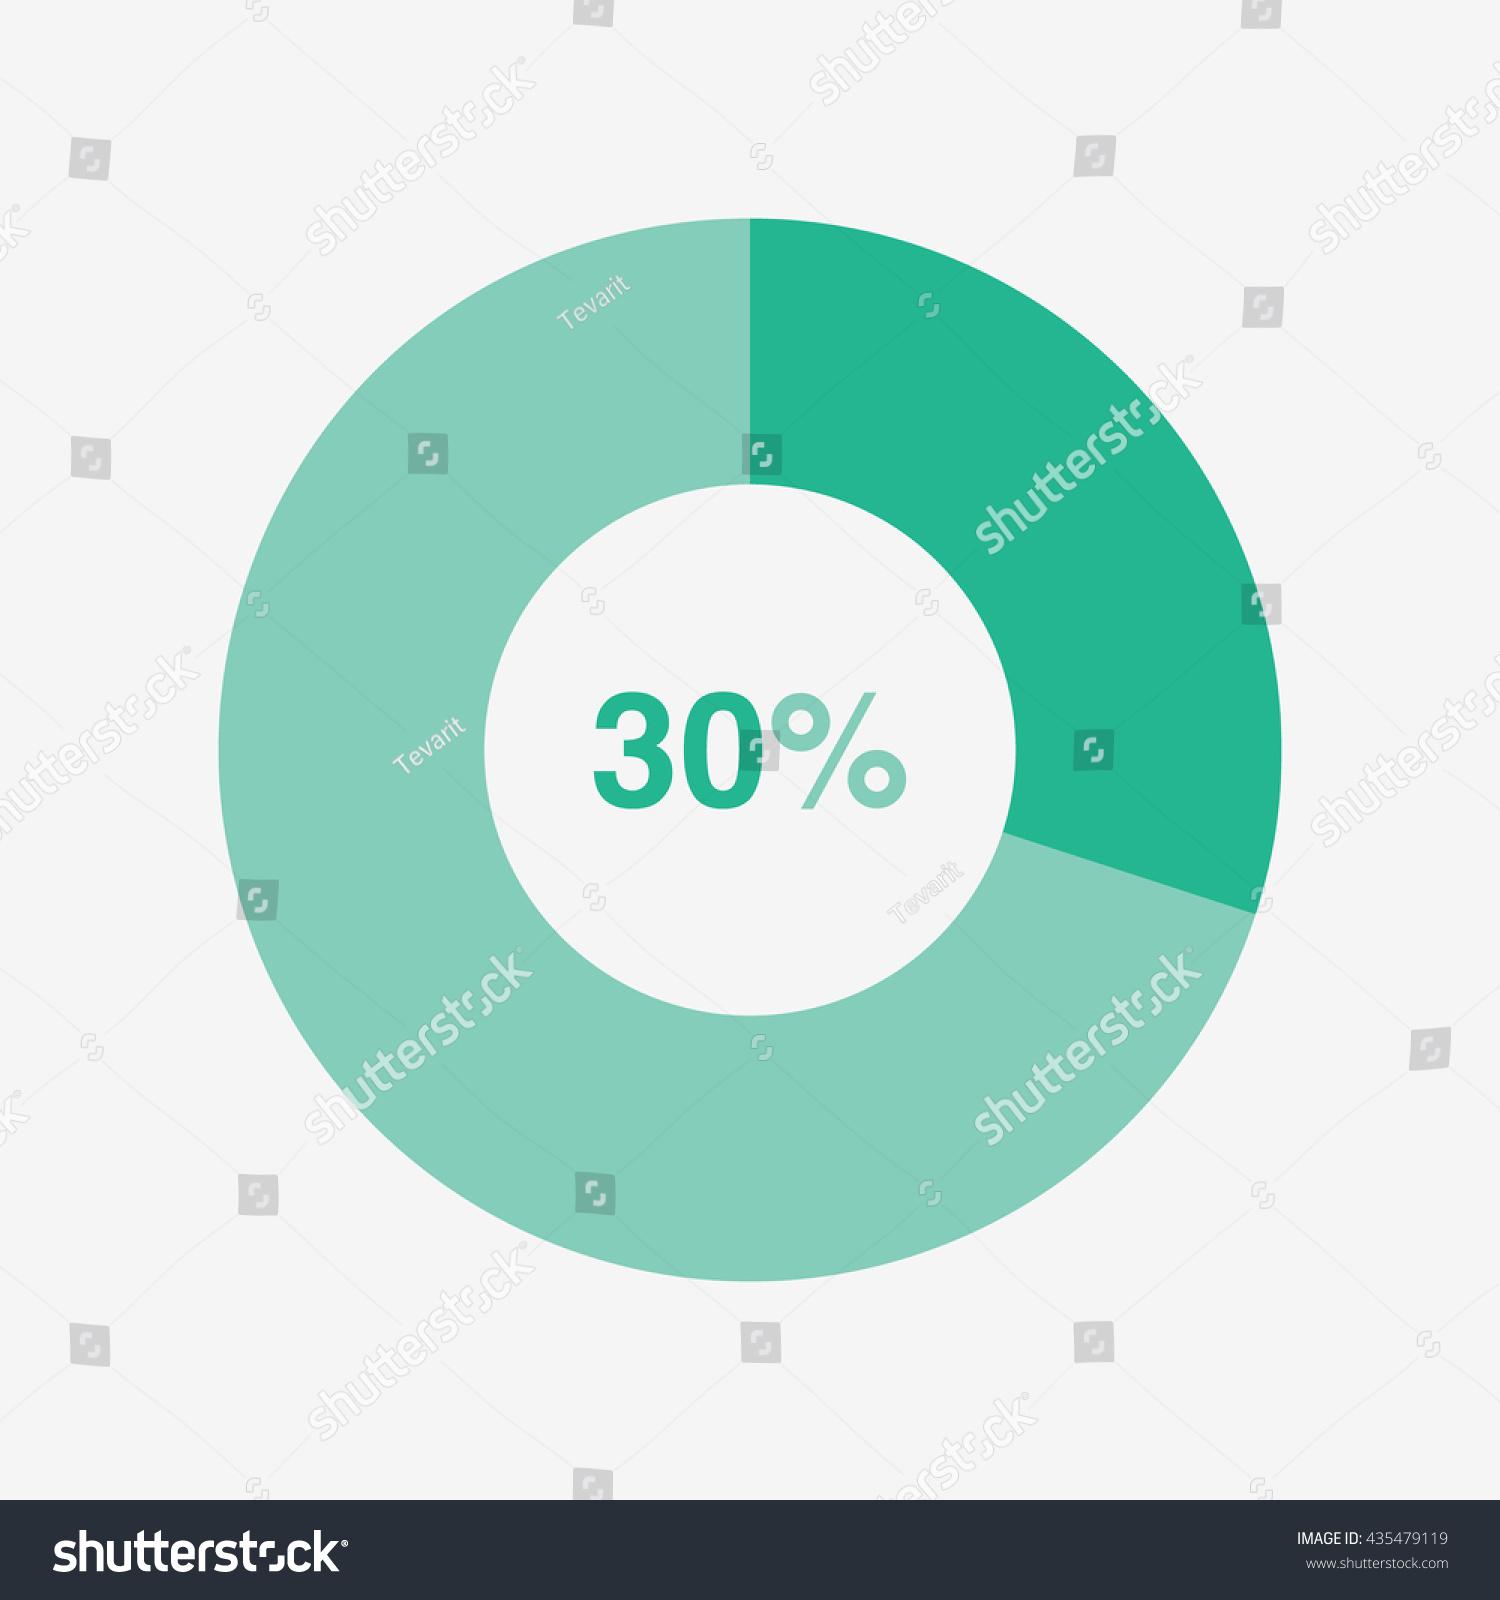 Icon pie green chart 30 percent stock vector 435479119 shutterstock icon pie green chart 30 percent pie chart vector nvjuhfo Choice Image